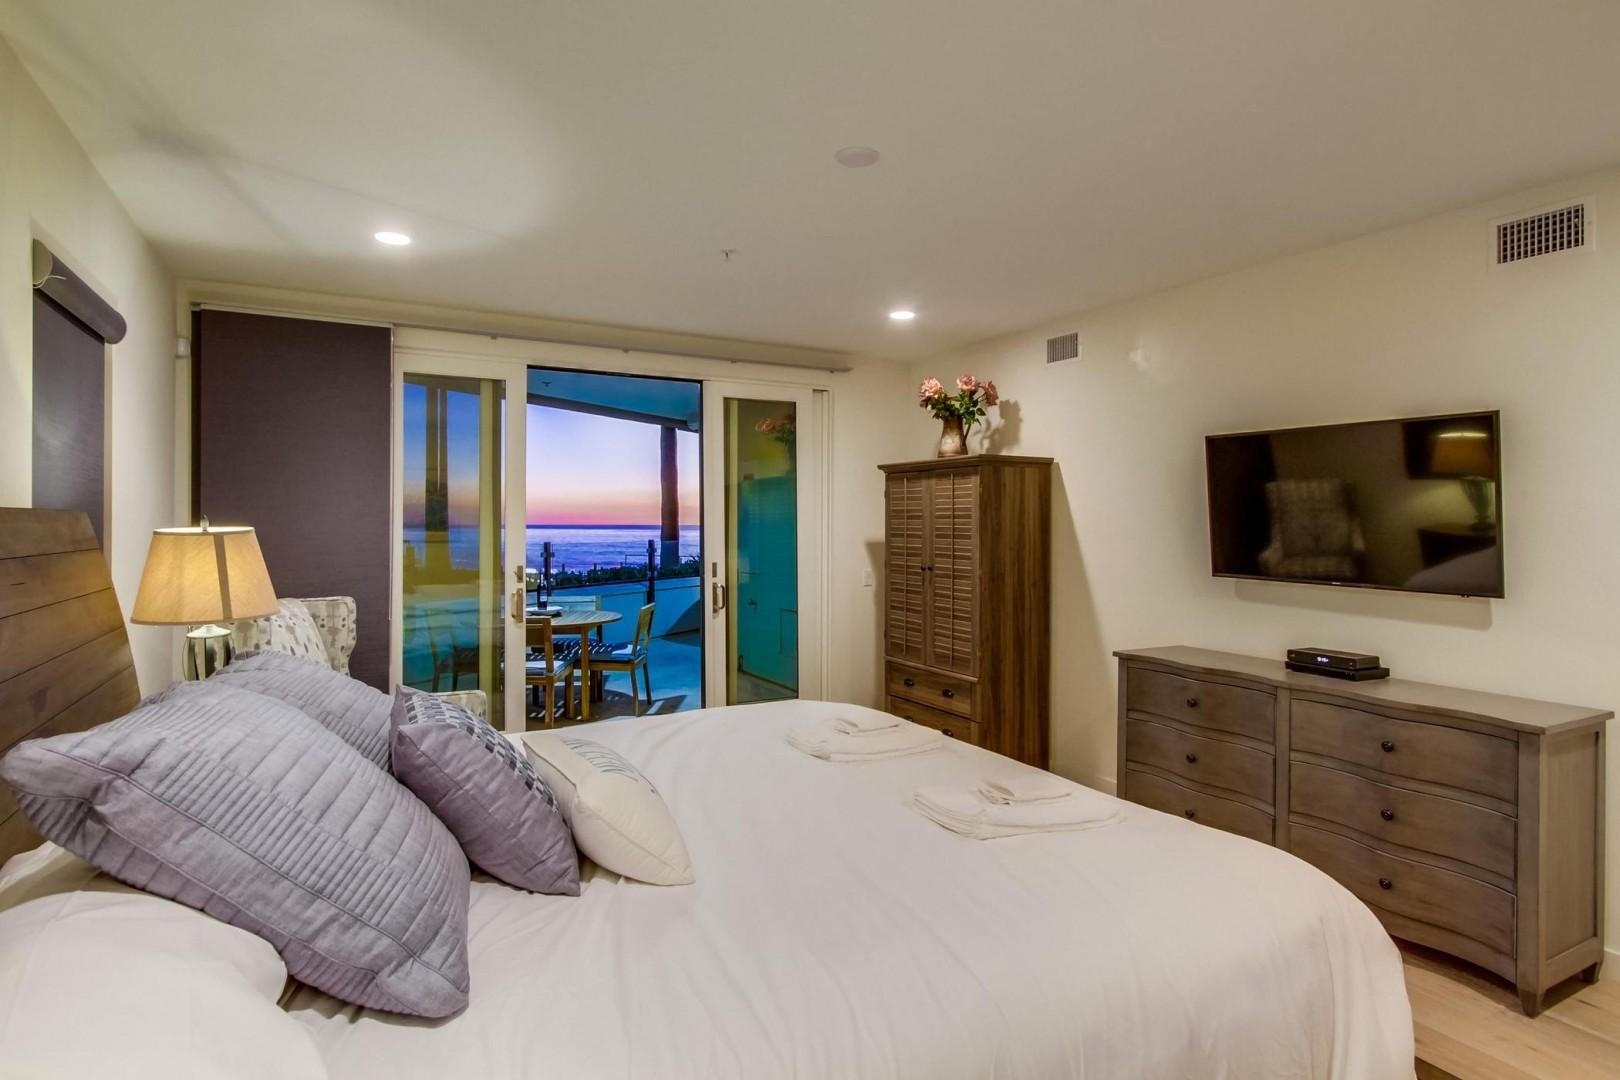 Master Suite with lie down ocean views